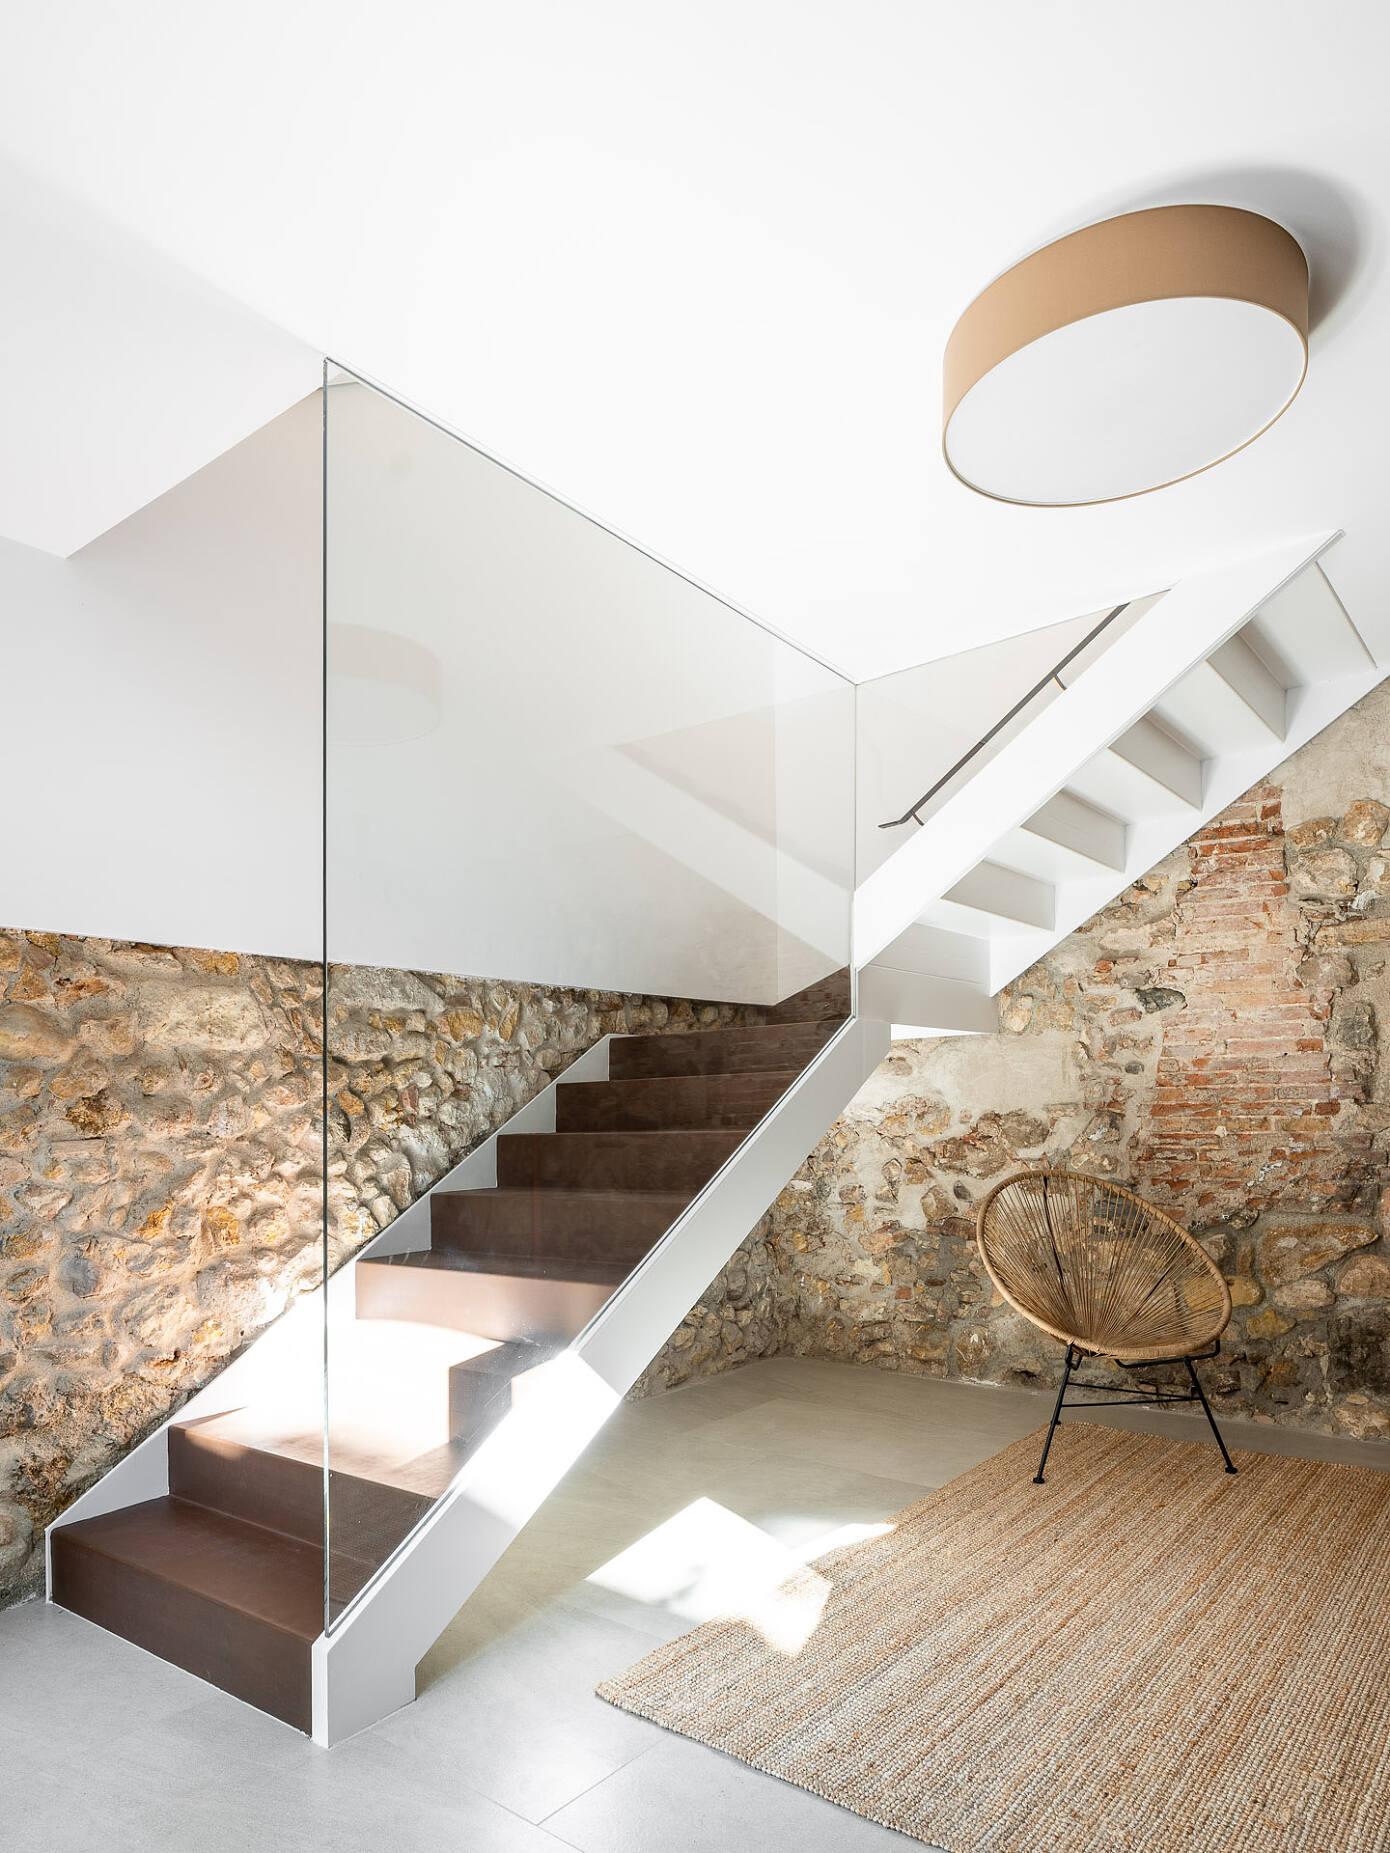 CA Marcelo by Guillem Carrera Arquitecte